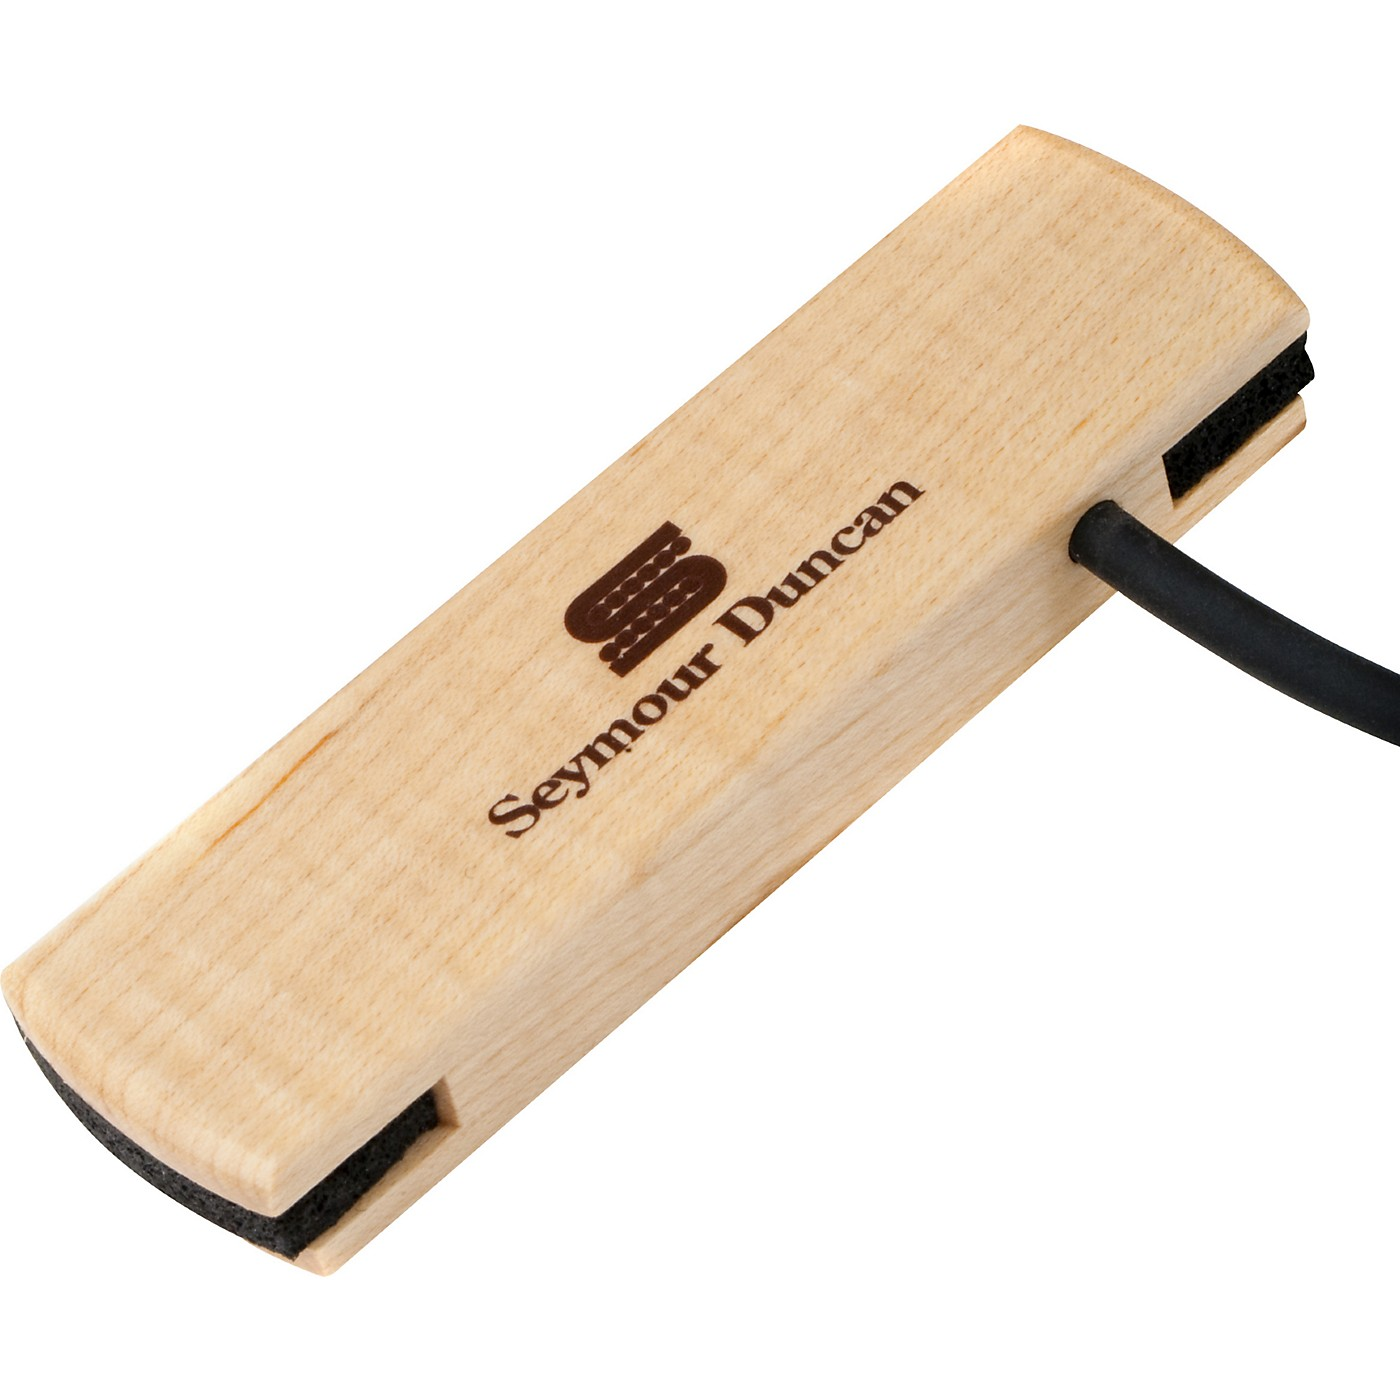 Seymour Duncan Woody SC Single-Coil Soundhole Pickup thumbnail